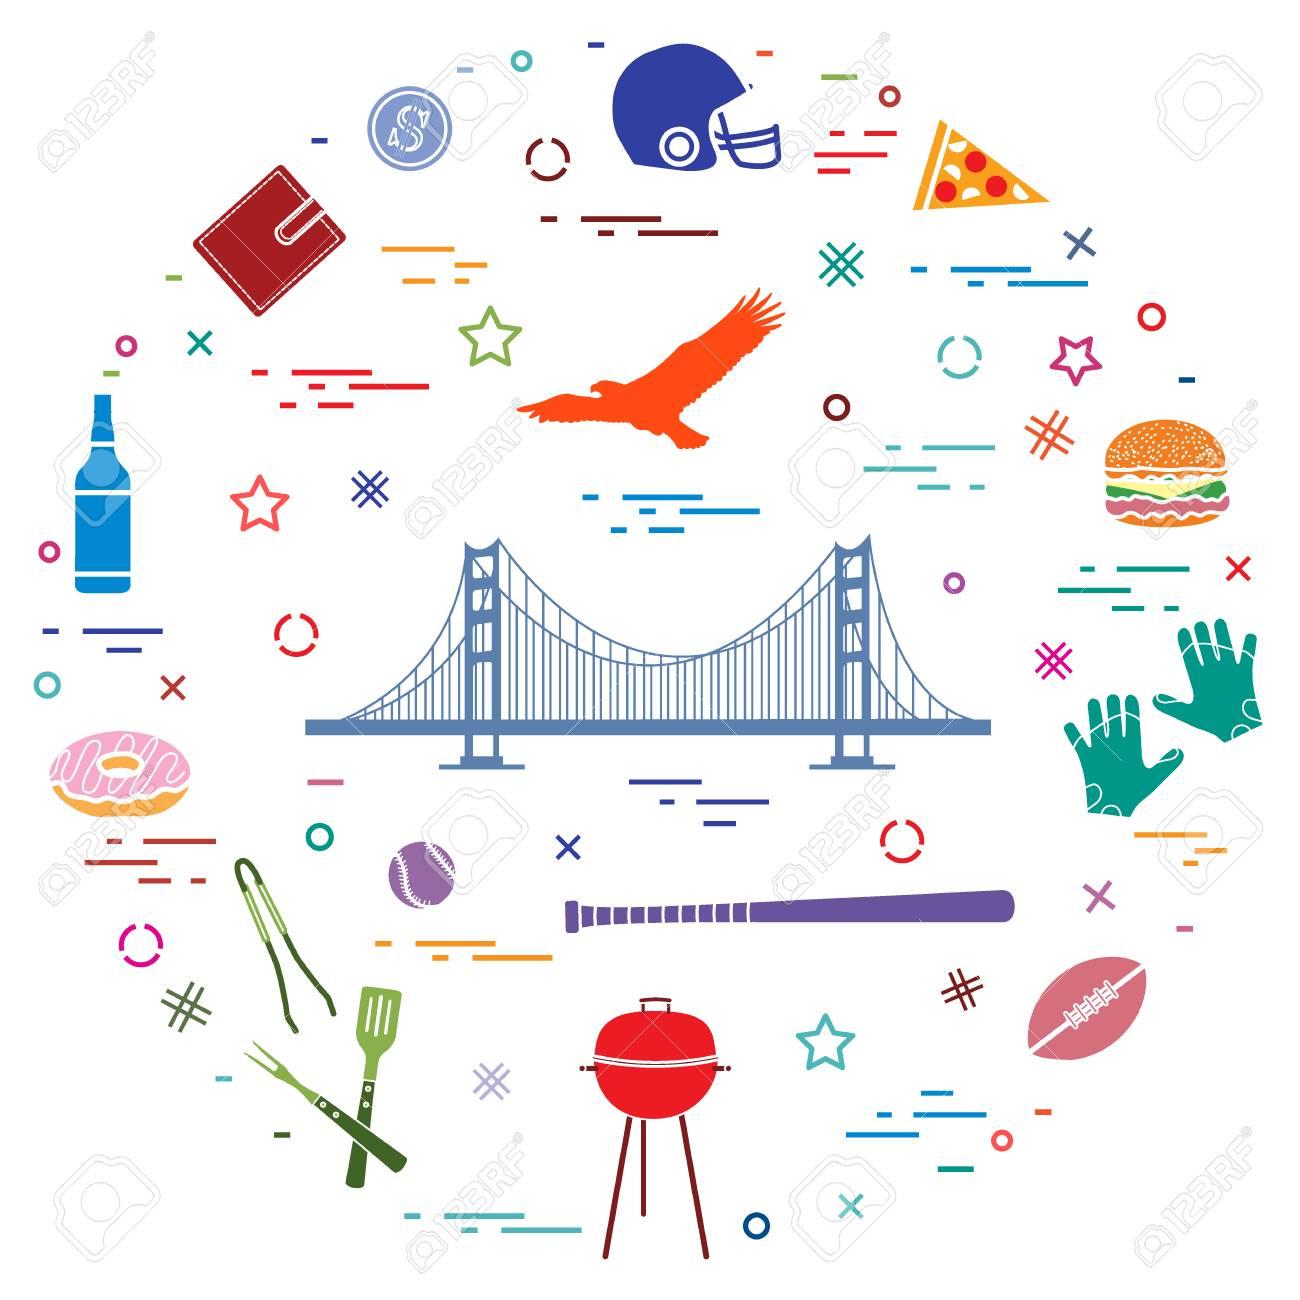 Symbols Of Usa Golden Gate Suspension Bridge And Soaring Eagle